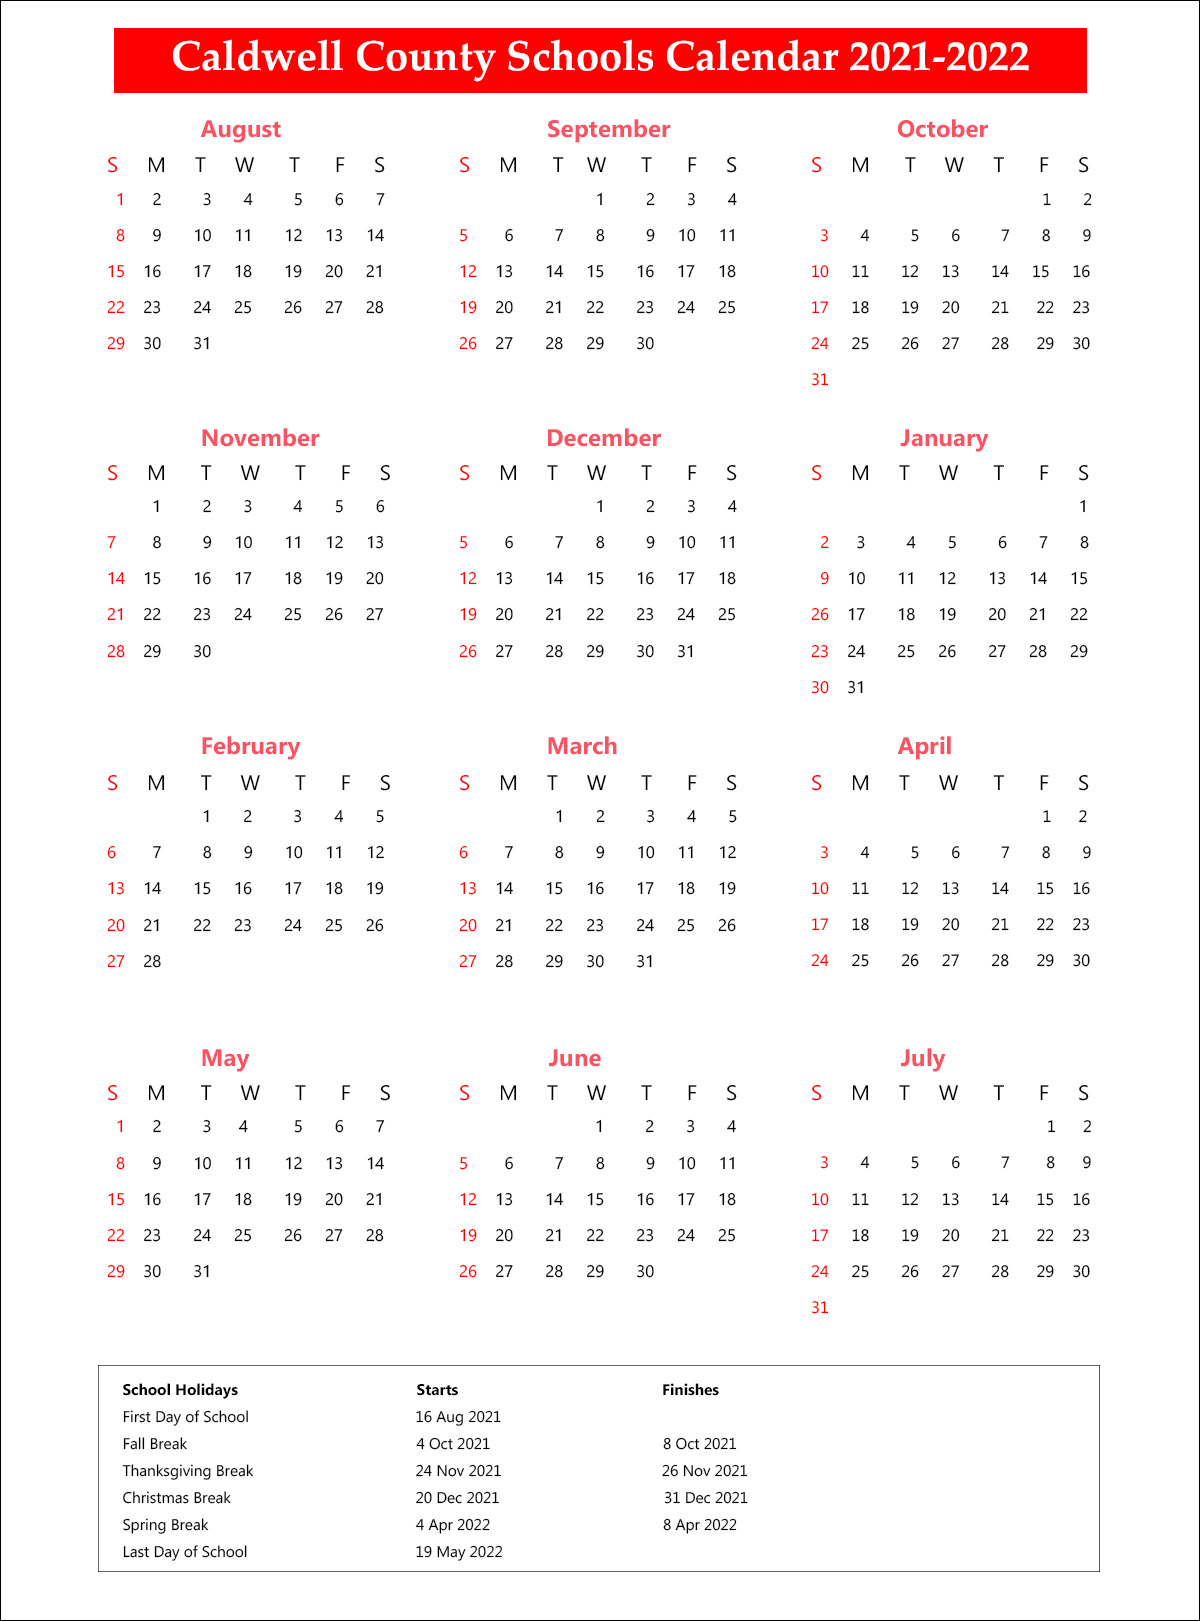 Caldwell County Schools Calendar 2021